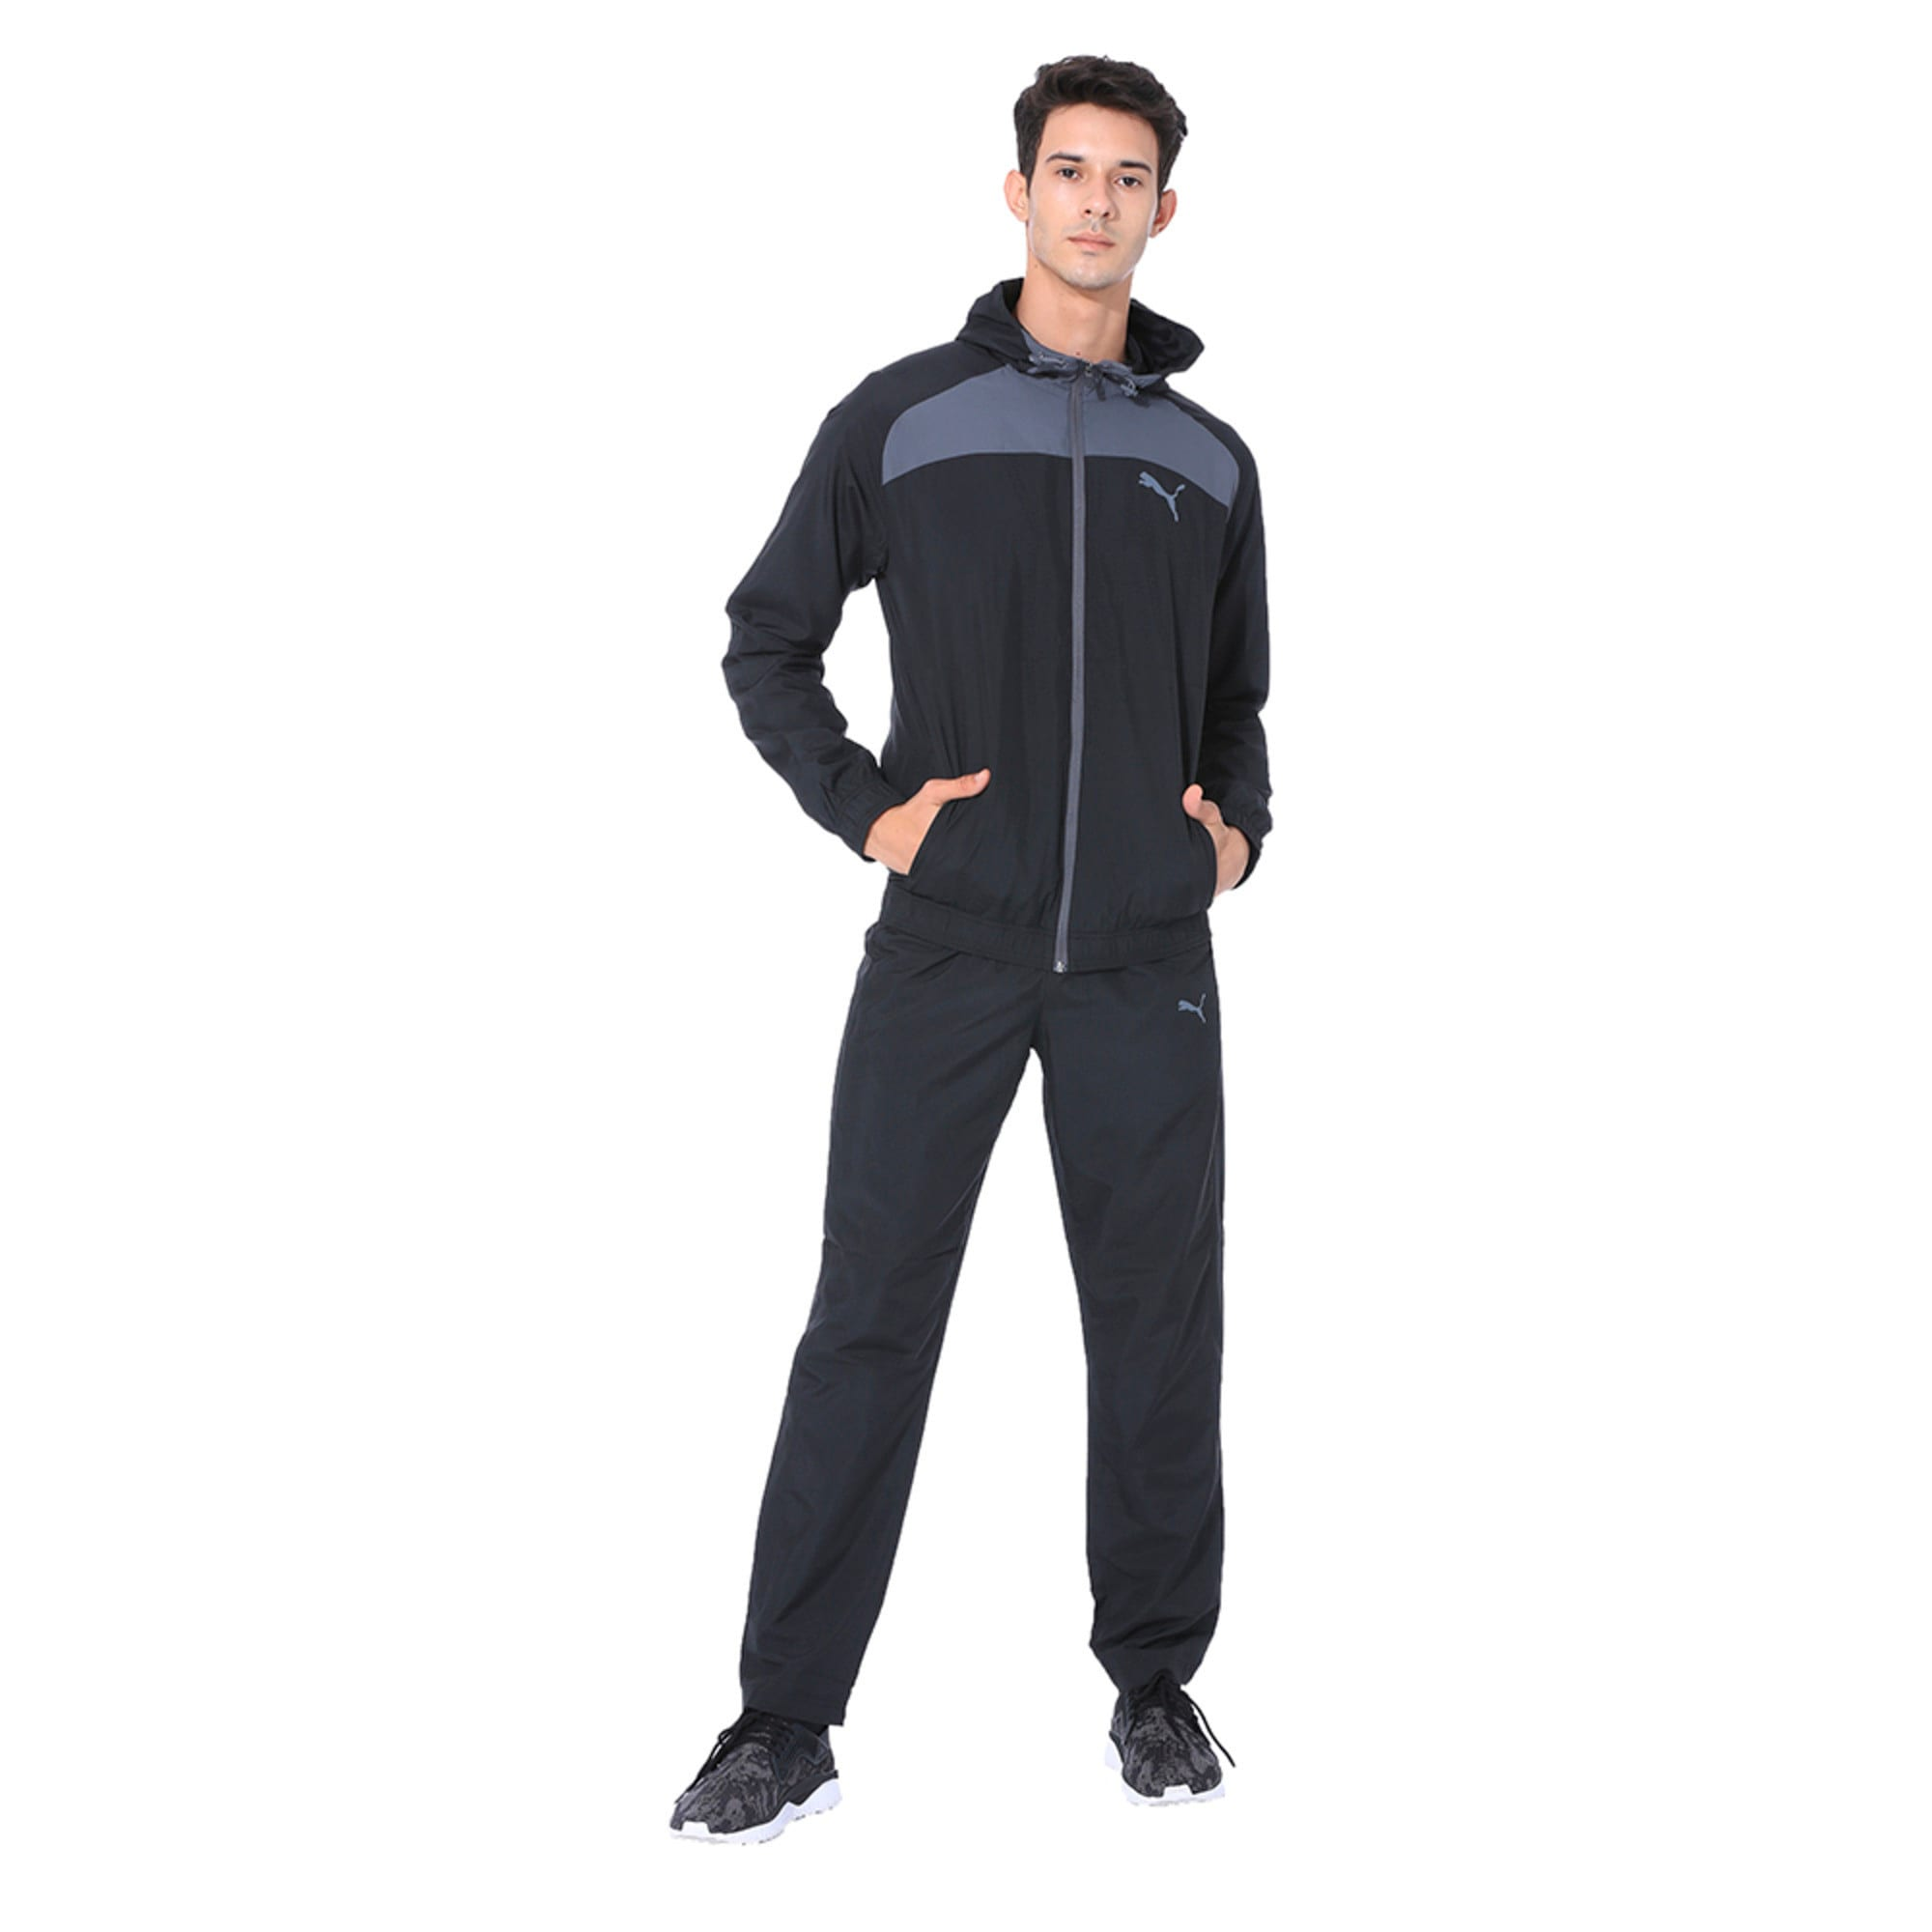 Thumbnail 1 of Modern Sport Hooded Suit Op. Peacoat-Pum, Puma Black-Iron Gate, medium-IND